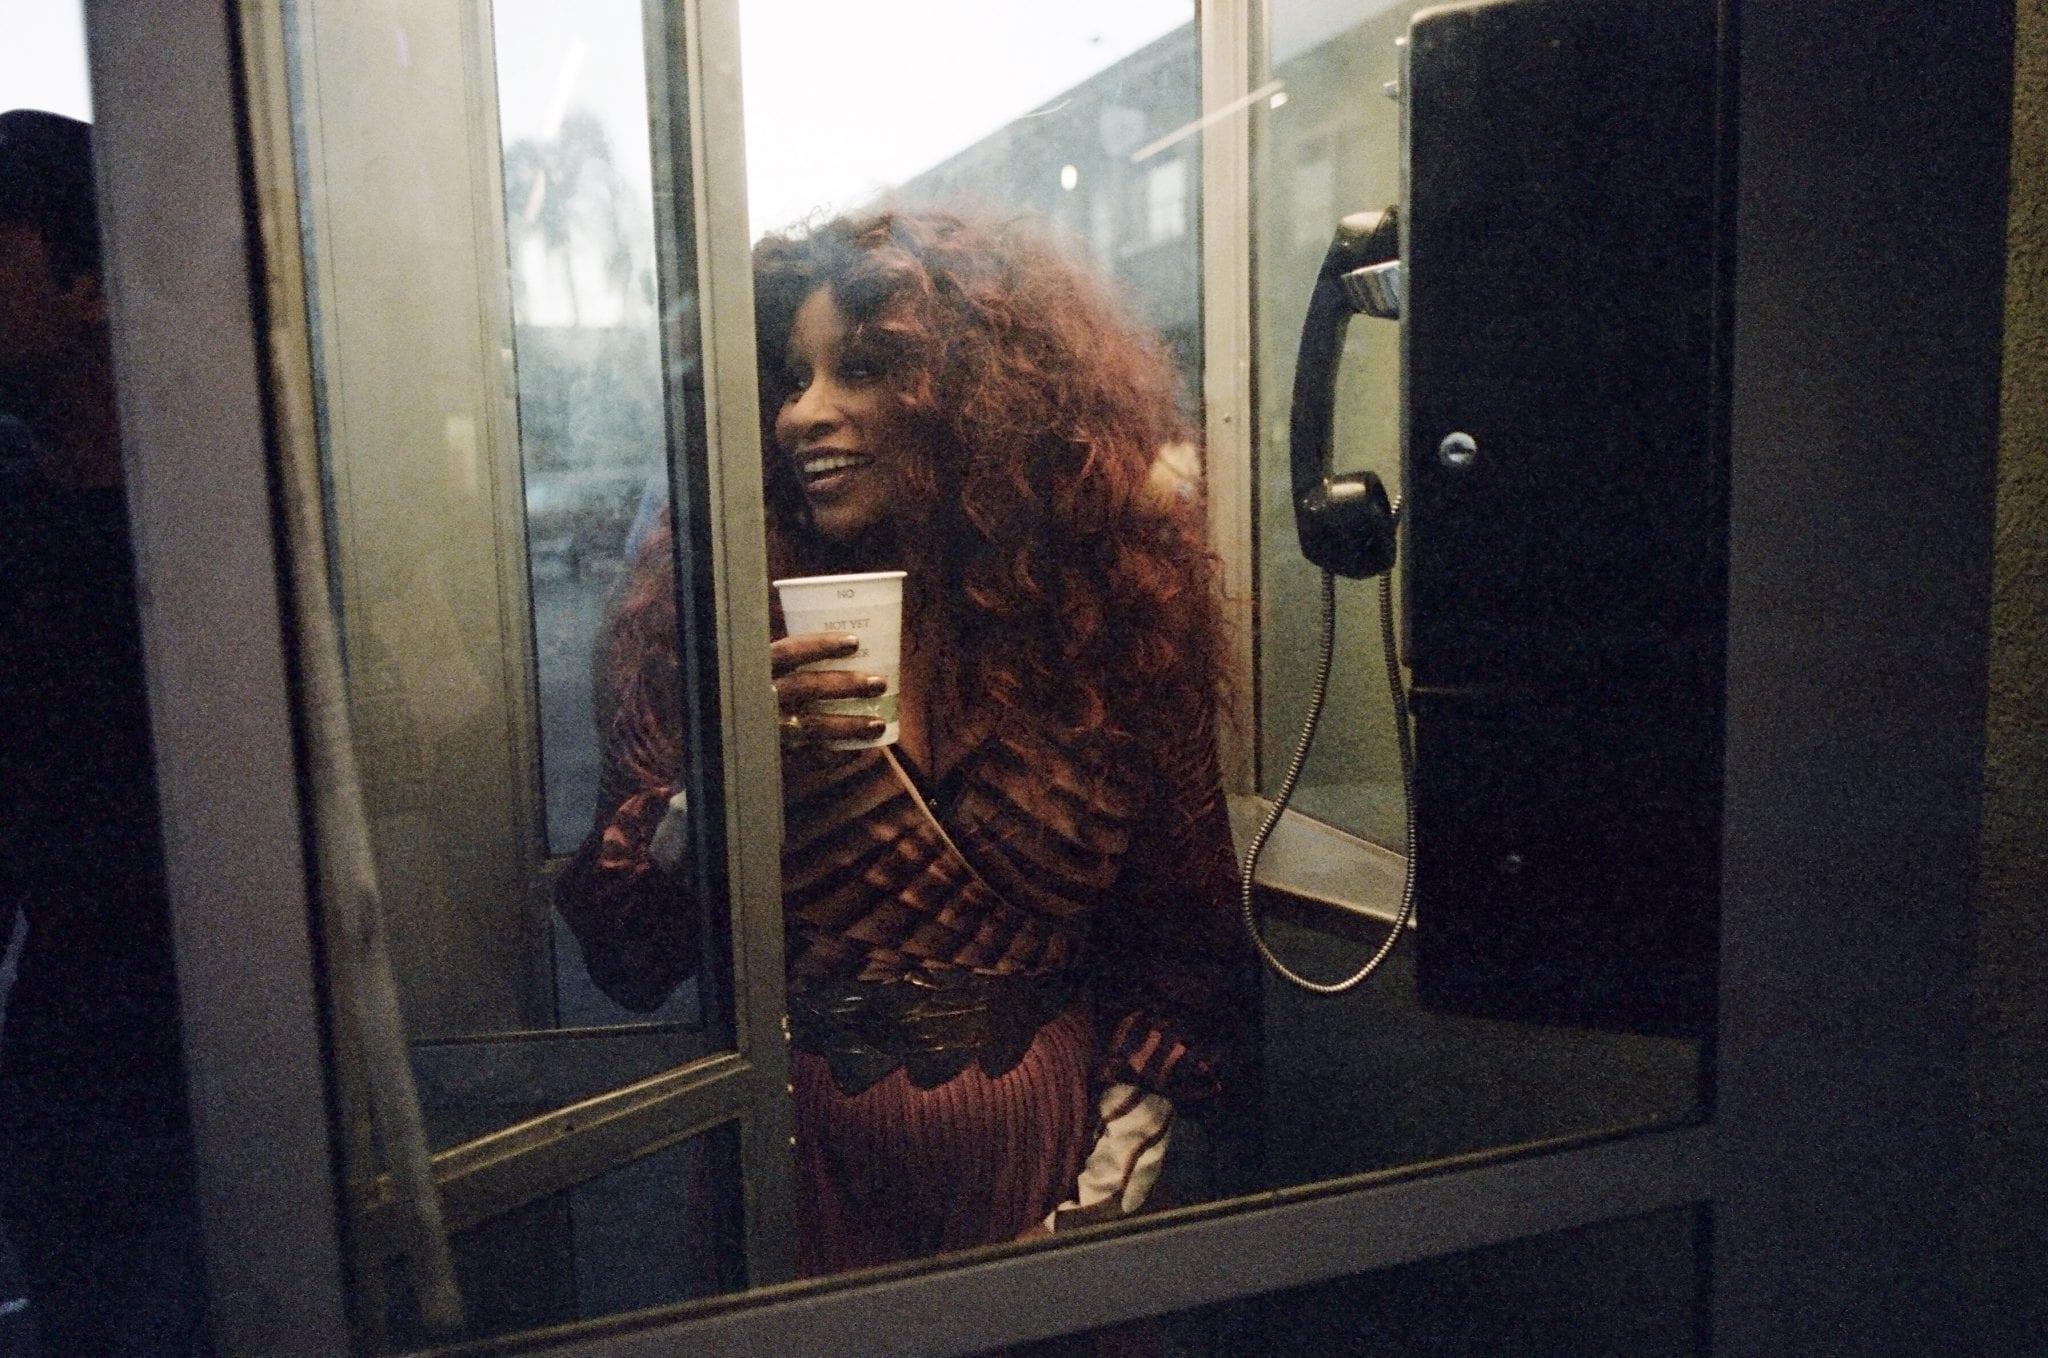 Chaka Khan #HelloHappiness Renell Medrano 5